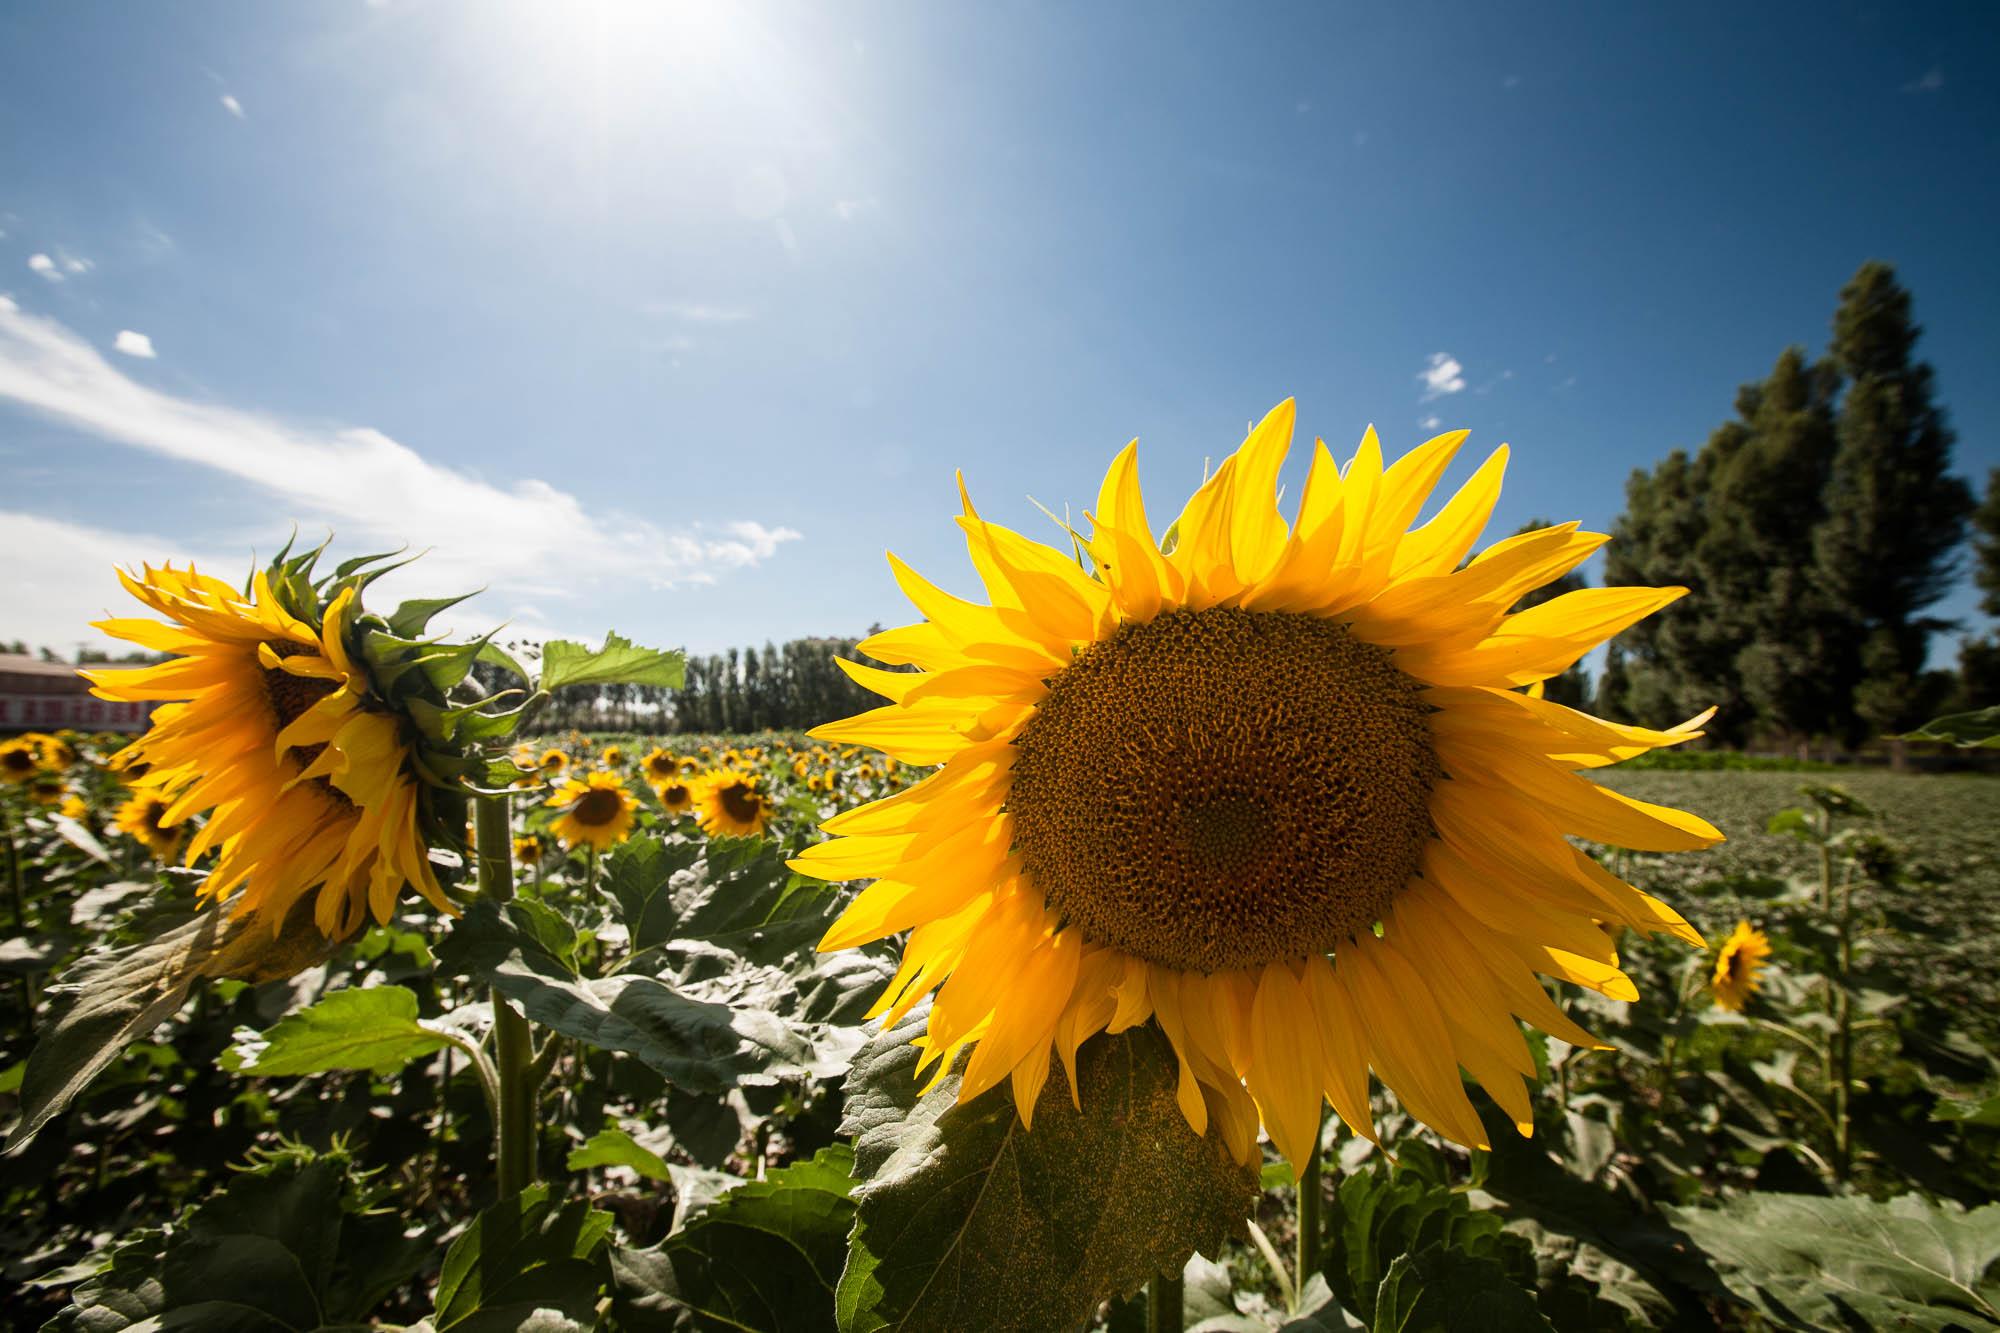 big fat sunflowers